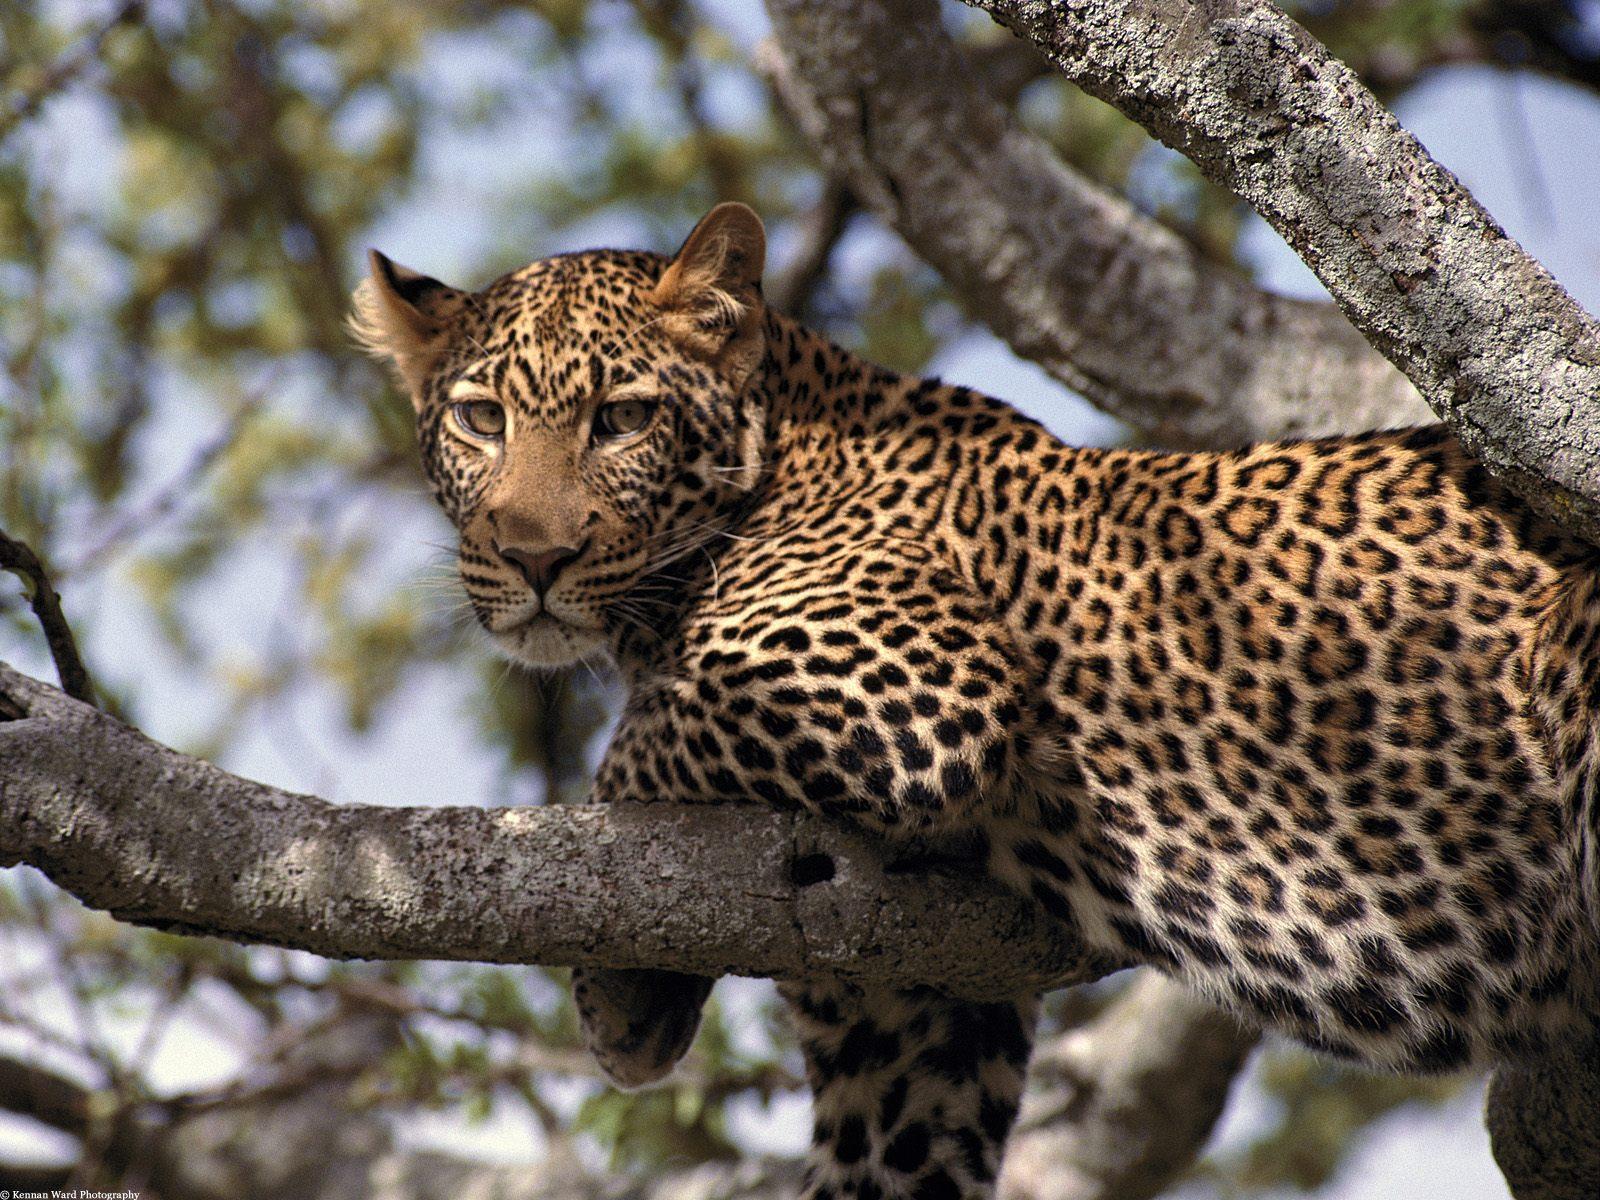 Amper Bae: wild animals in africa